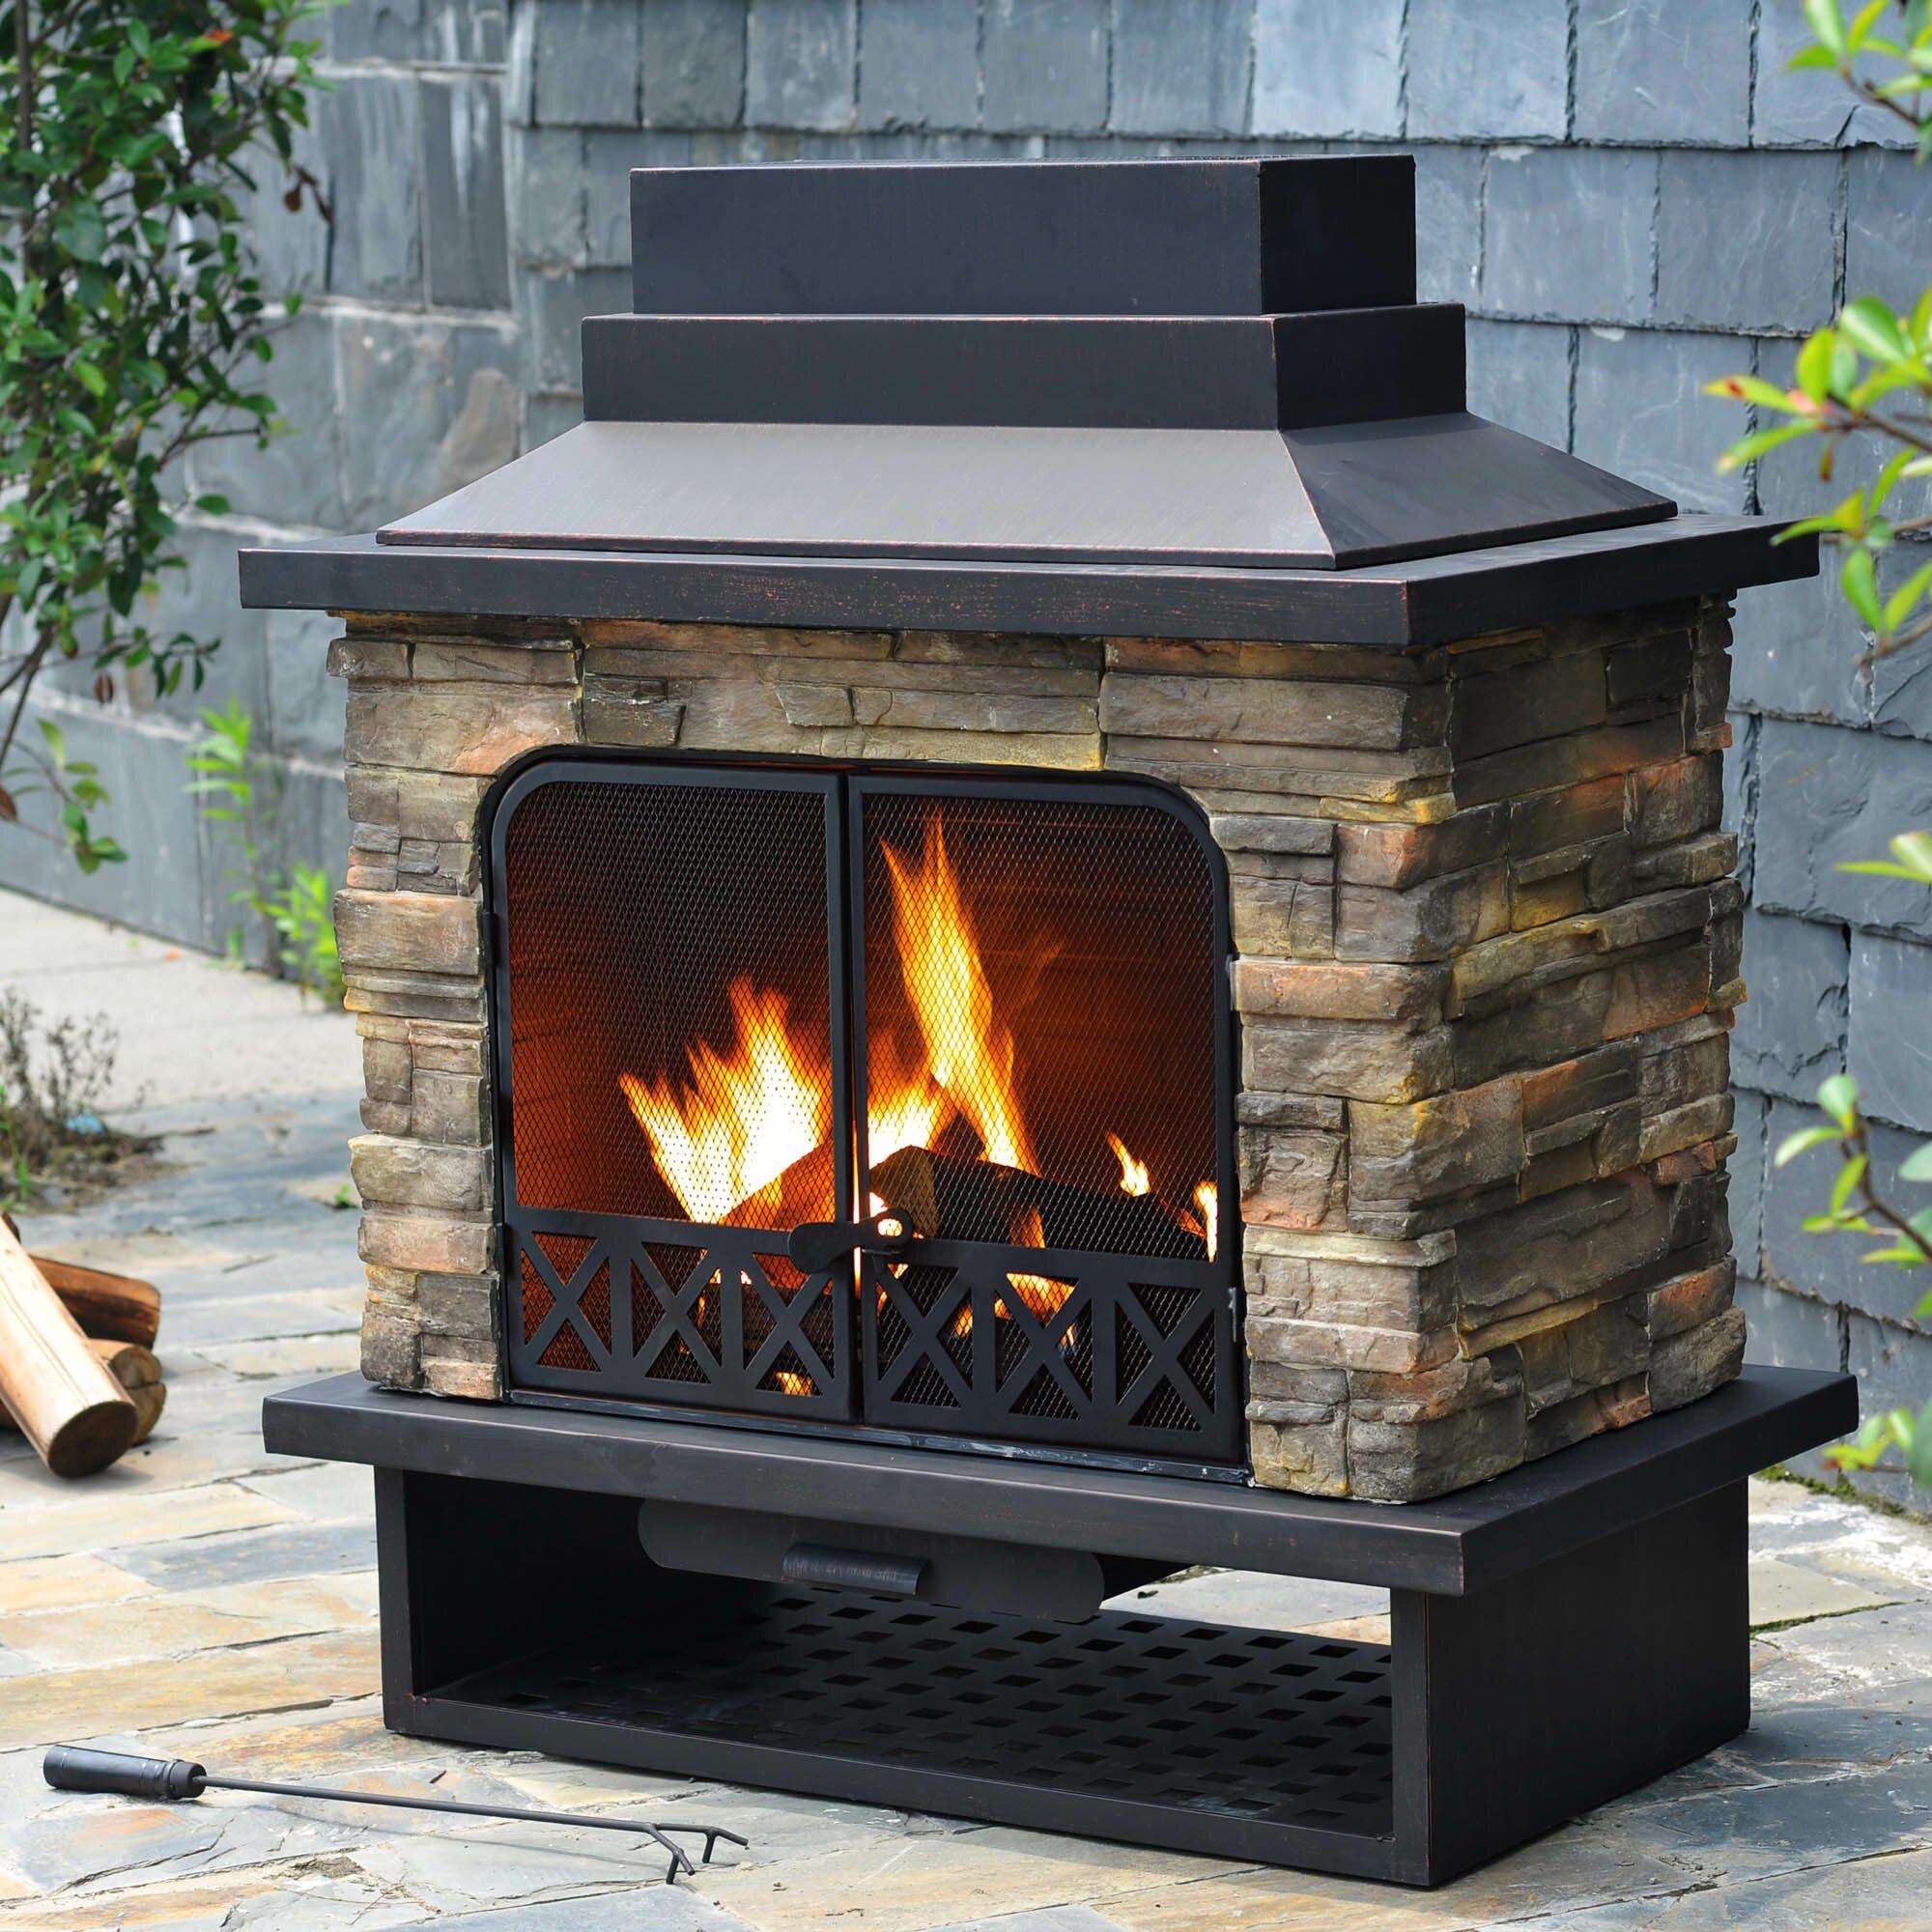 Sunjoy Felicia Steel Wood Outdoor Fireplace & Reviews ... on Backyard Chimney Fireplace id=76259